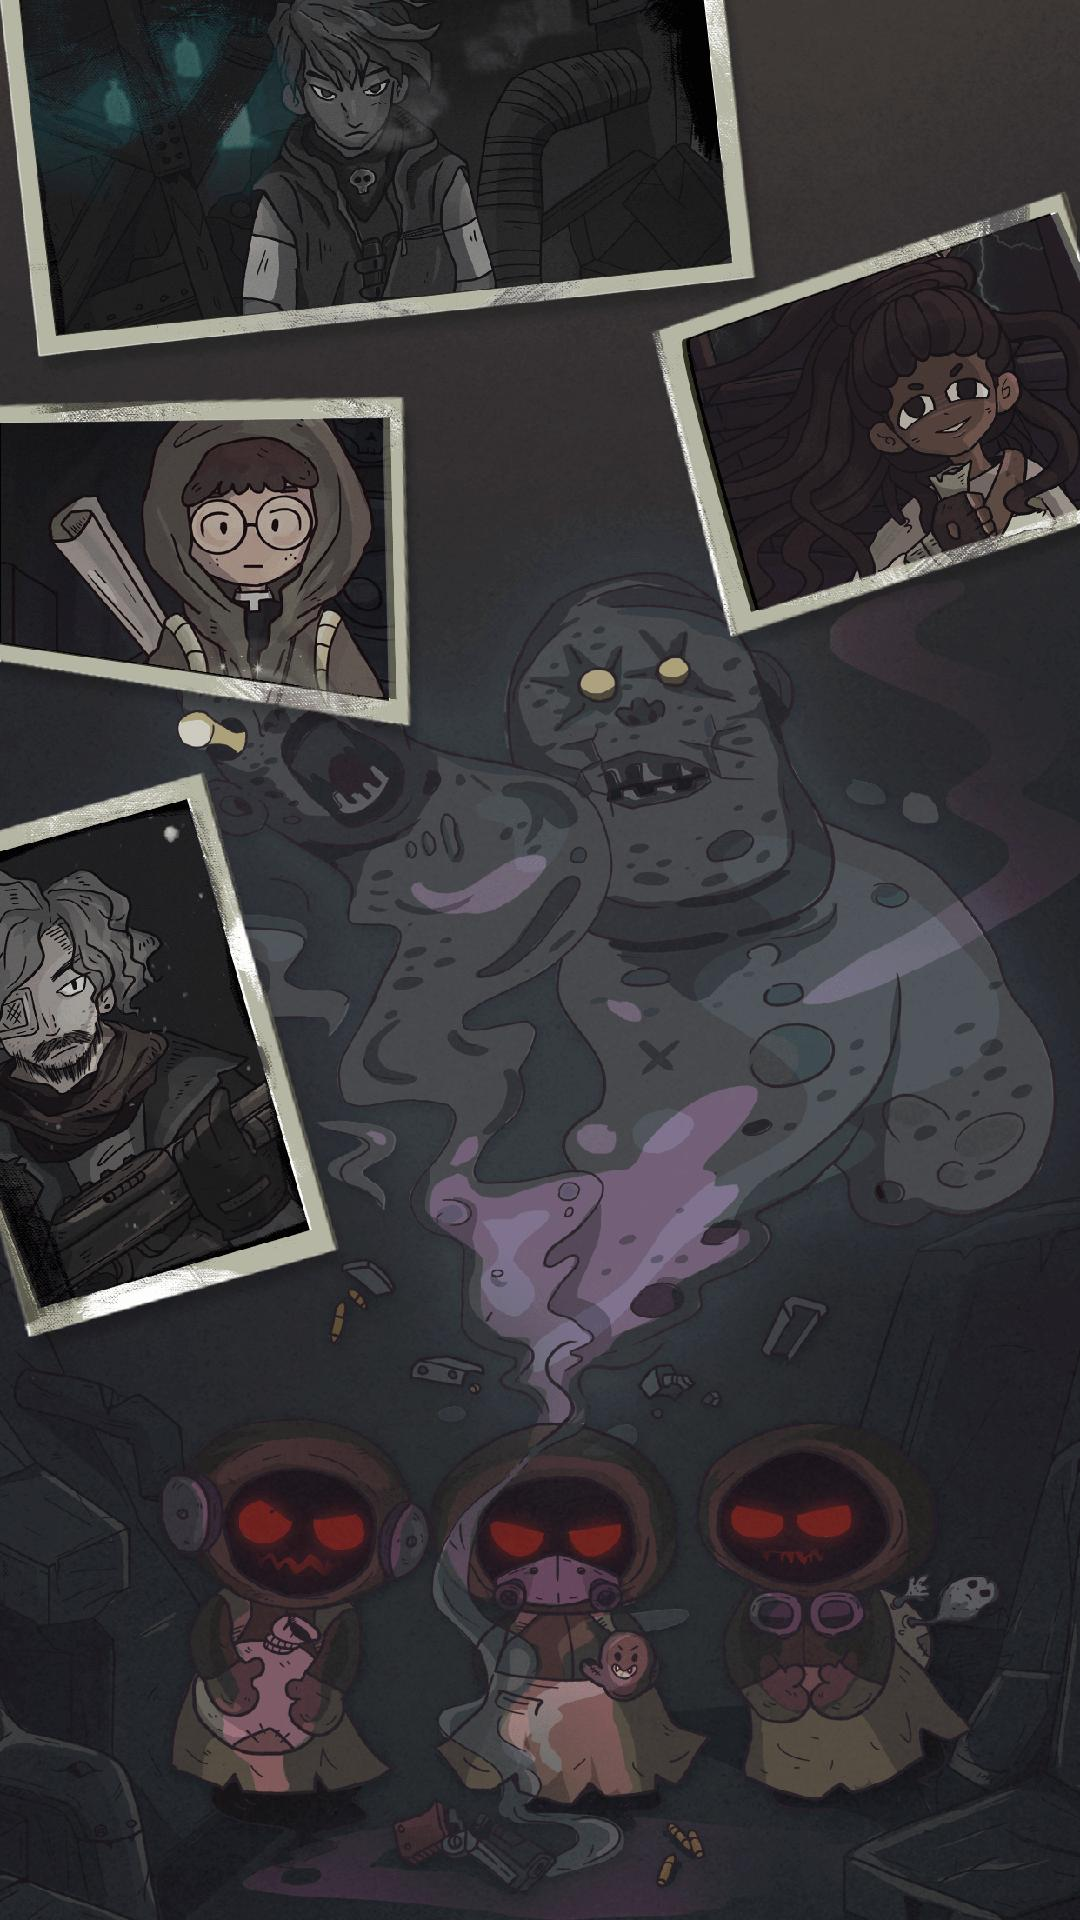 7Days:轻小说文字冒险游戏